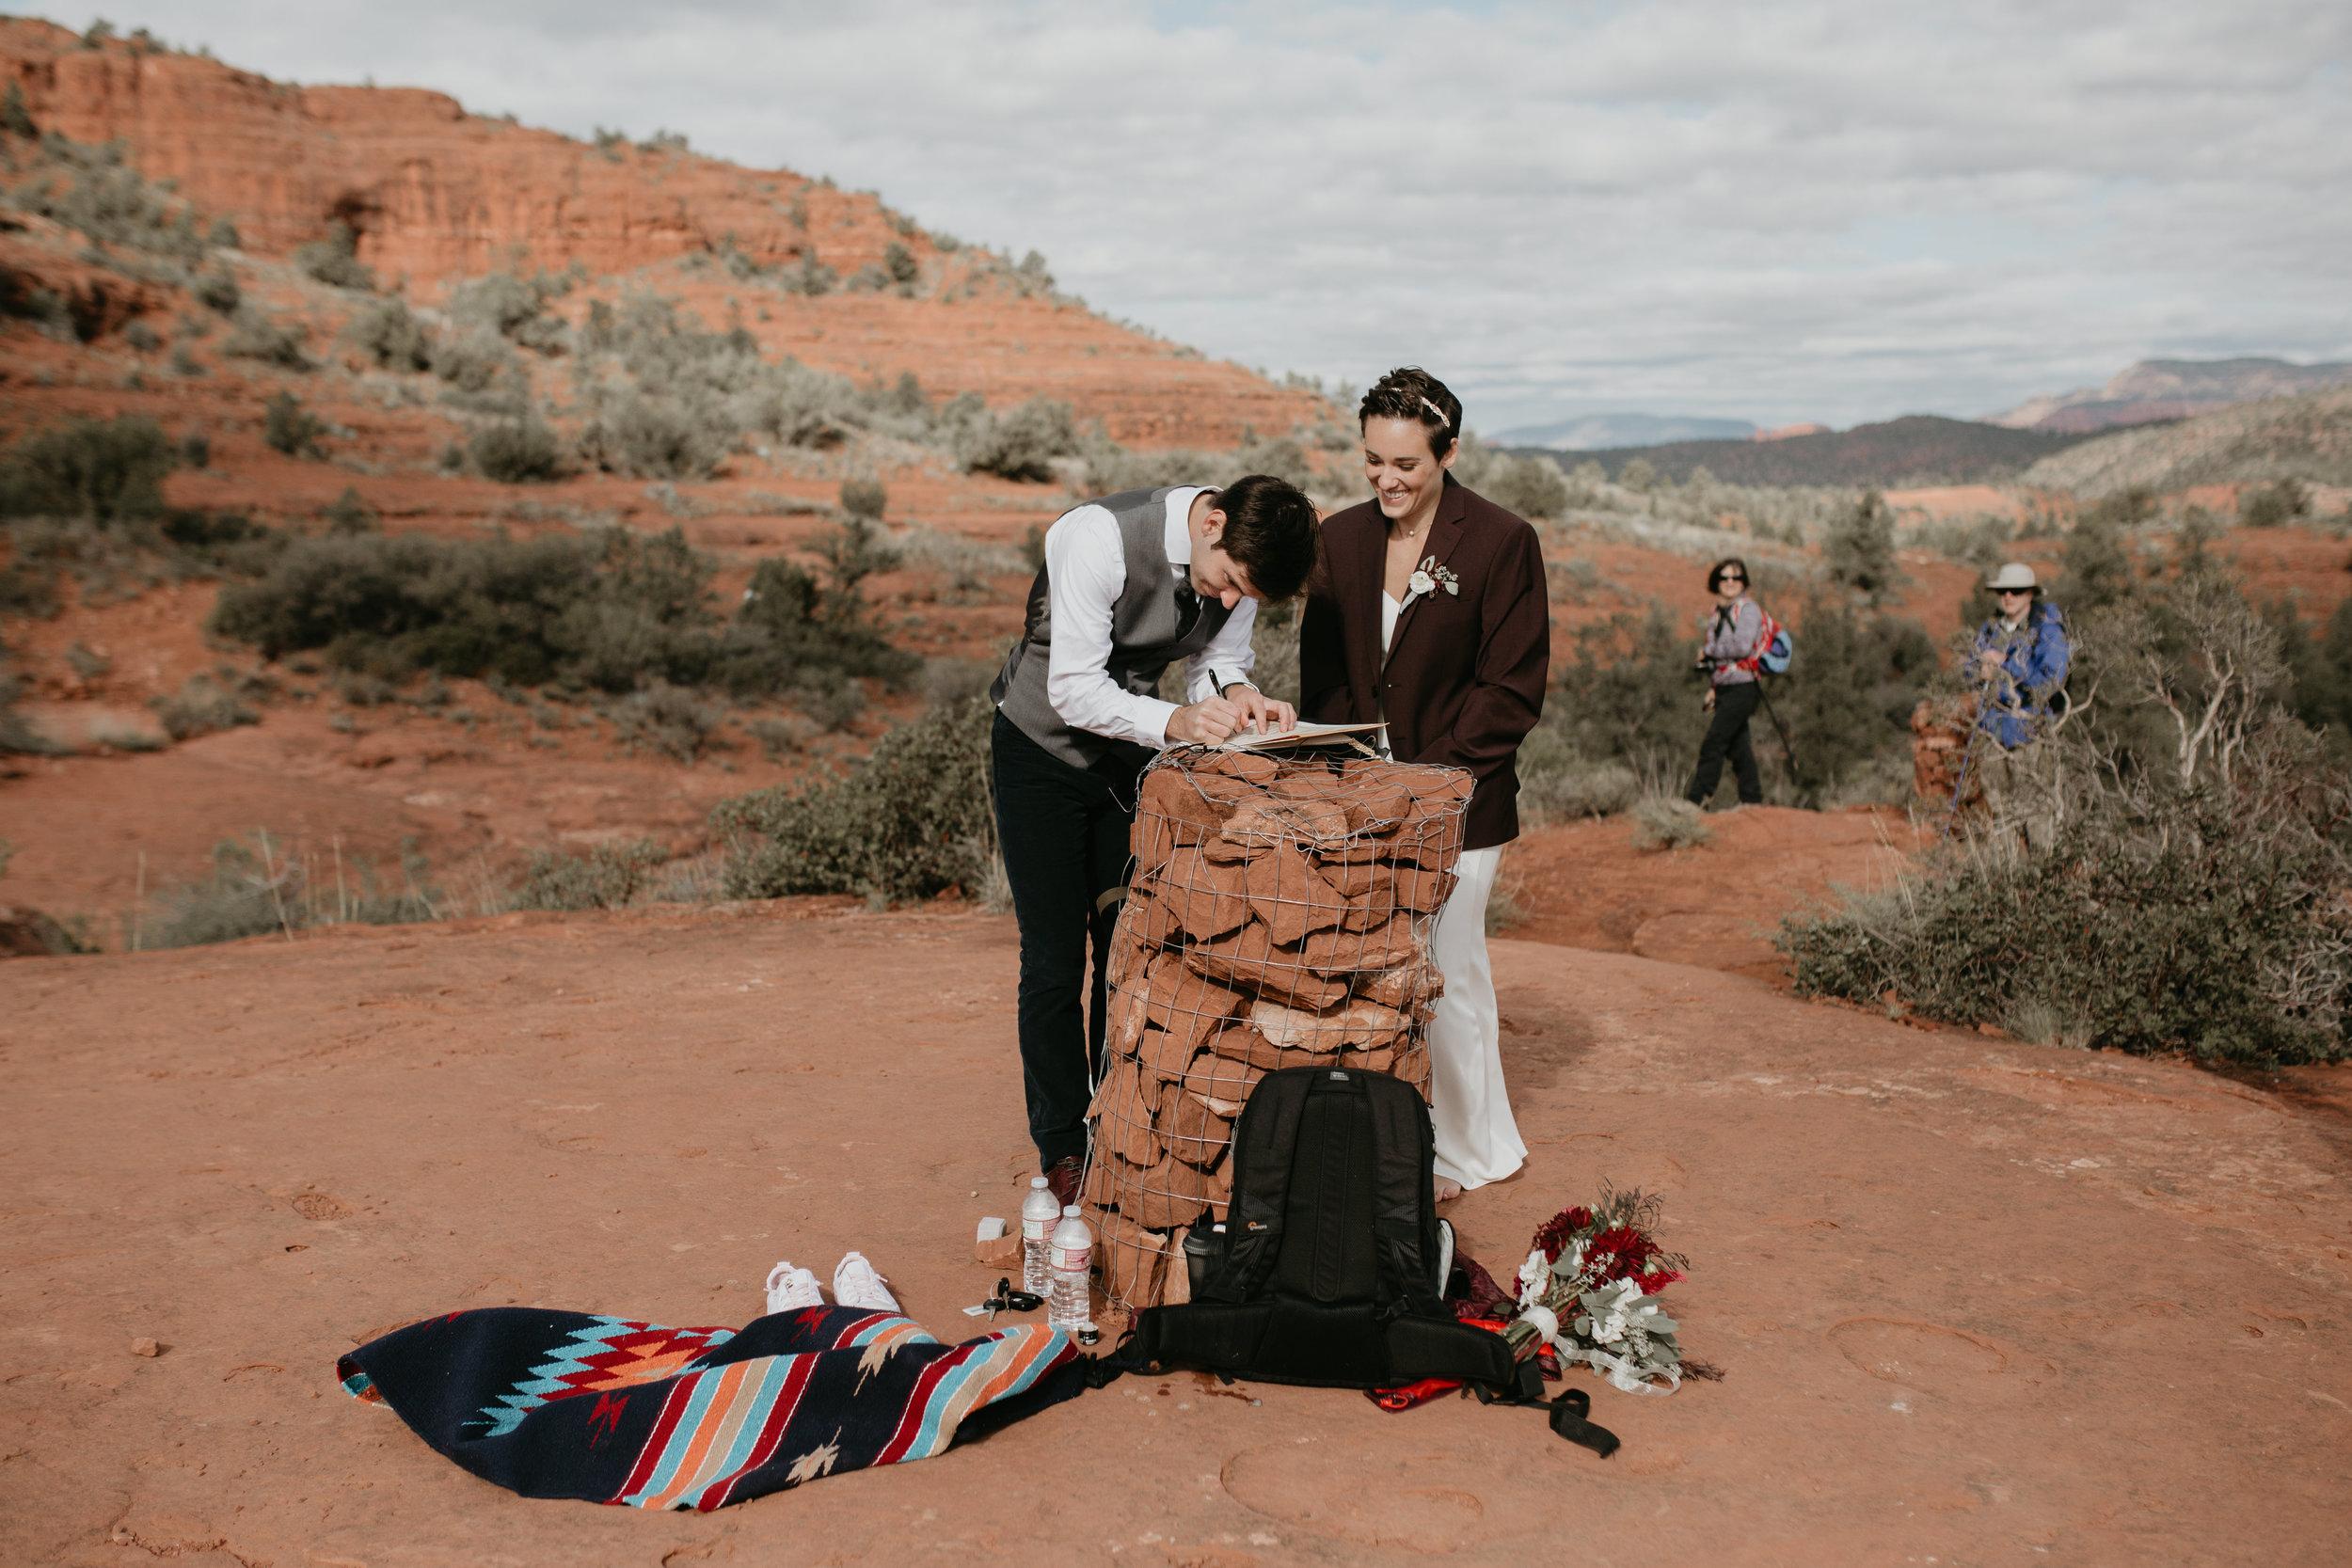 nicole-daacke-photography-sedona-arizona-destination-elopement-wedding-photographer-catherdral-rock-hiking-elopement-sedona-river-elopement-photos-desert-rock-wedding-photographer-laid-back-spontaneous-elopement-92.jpg